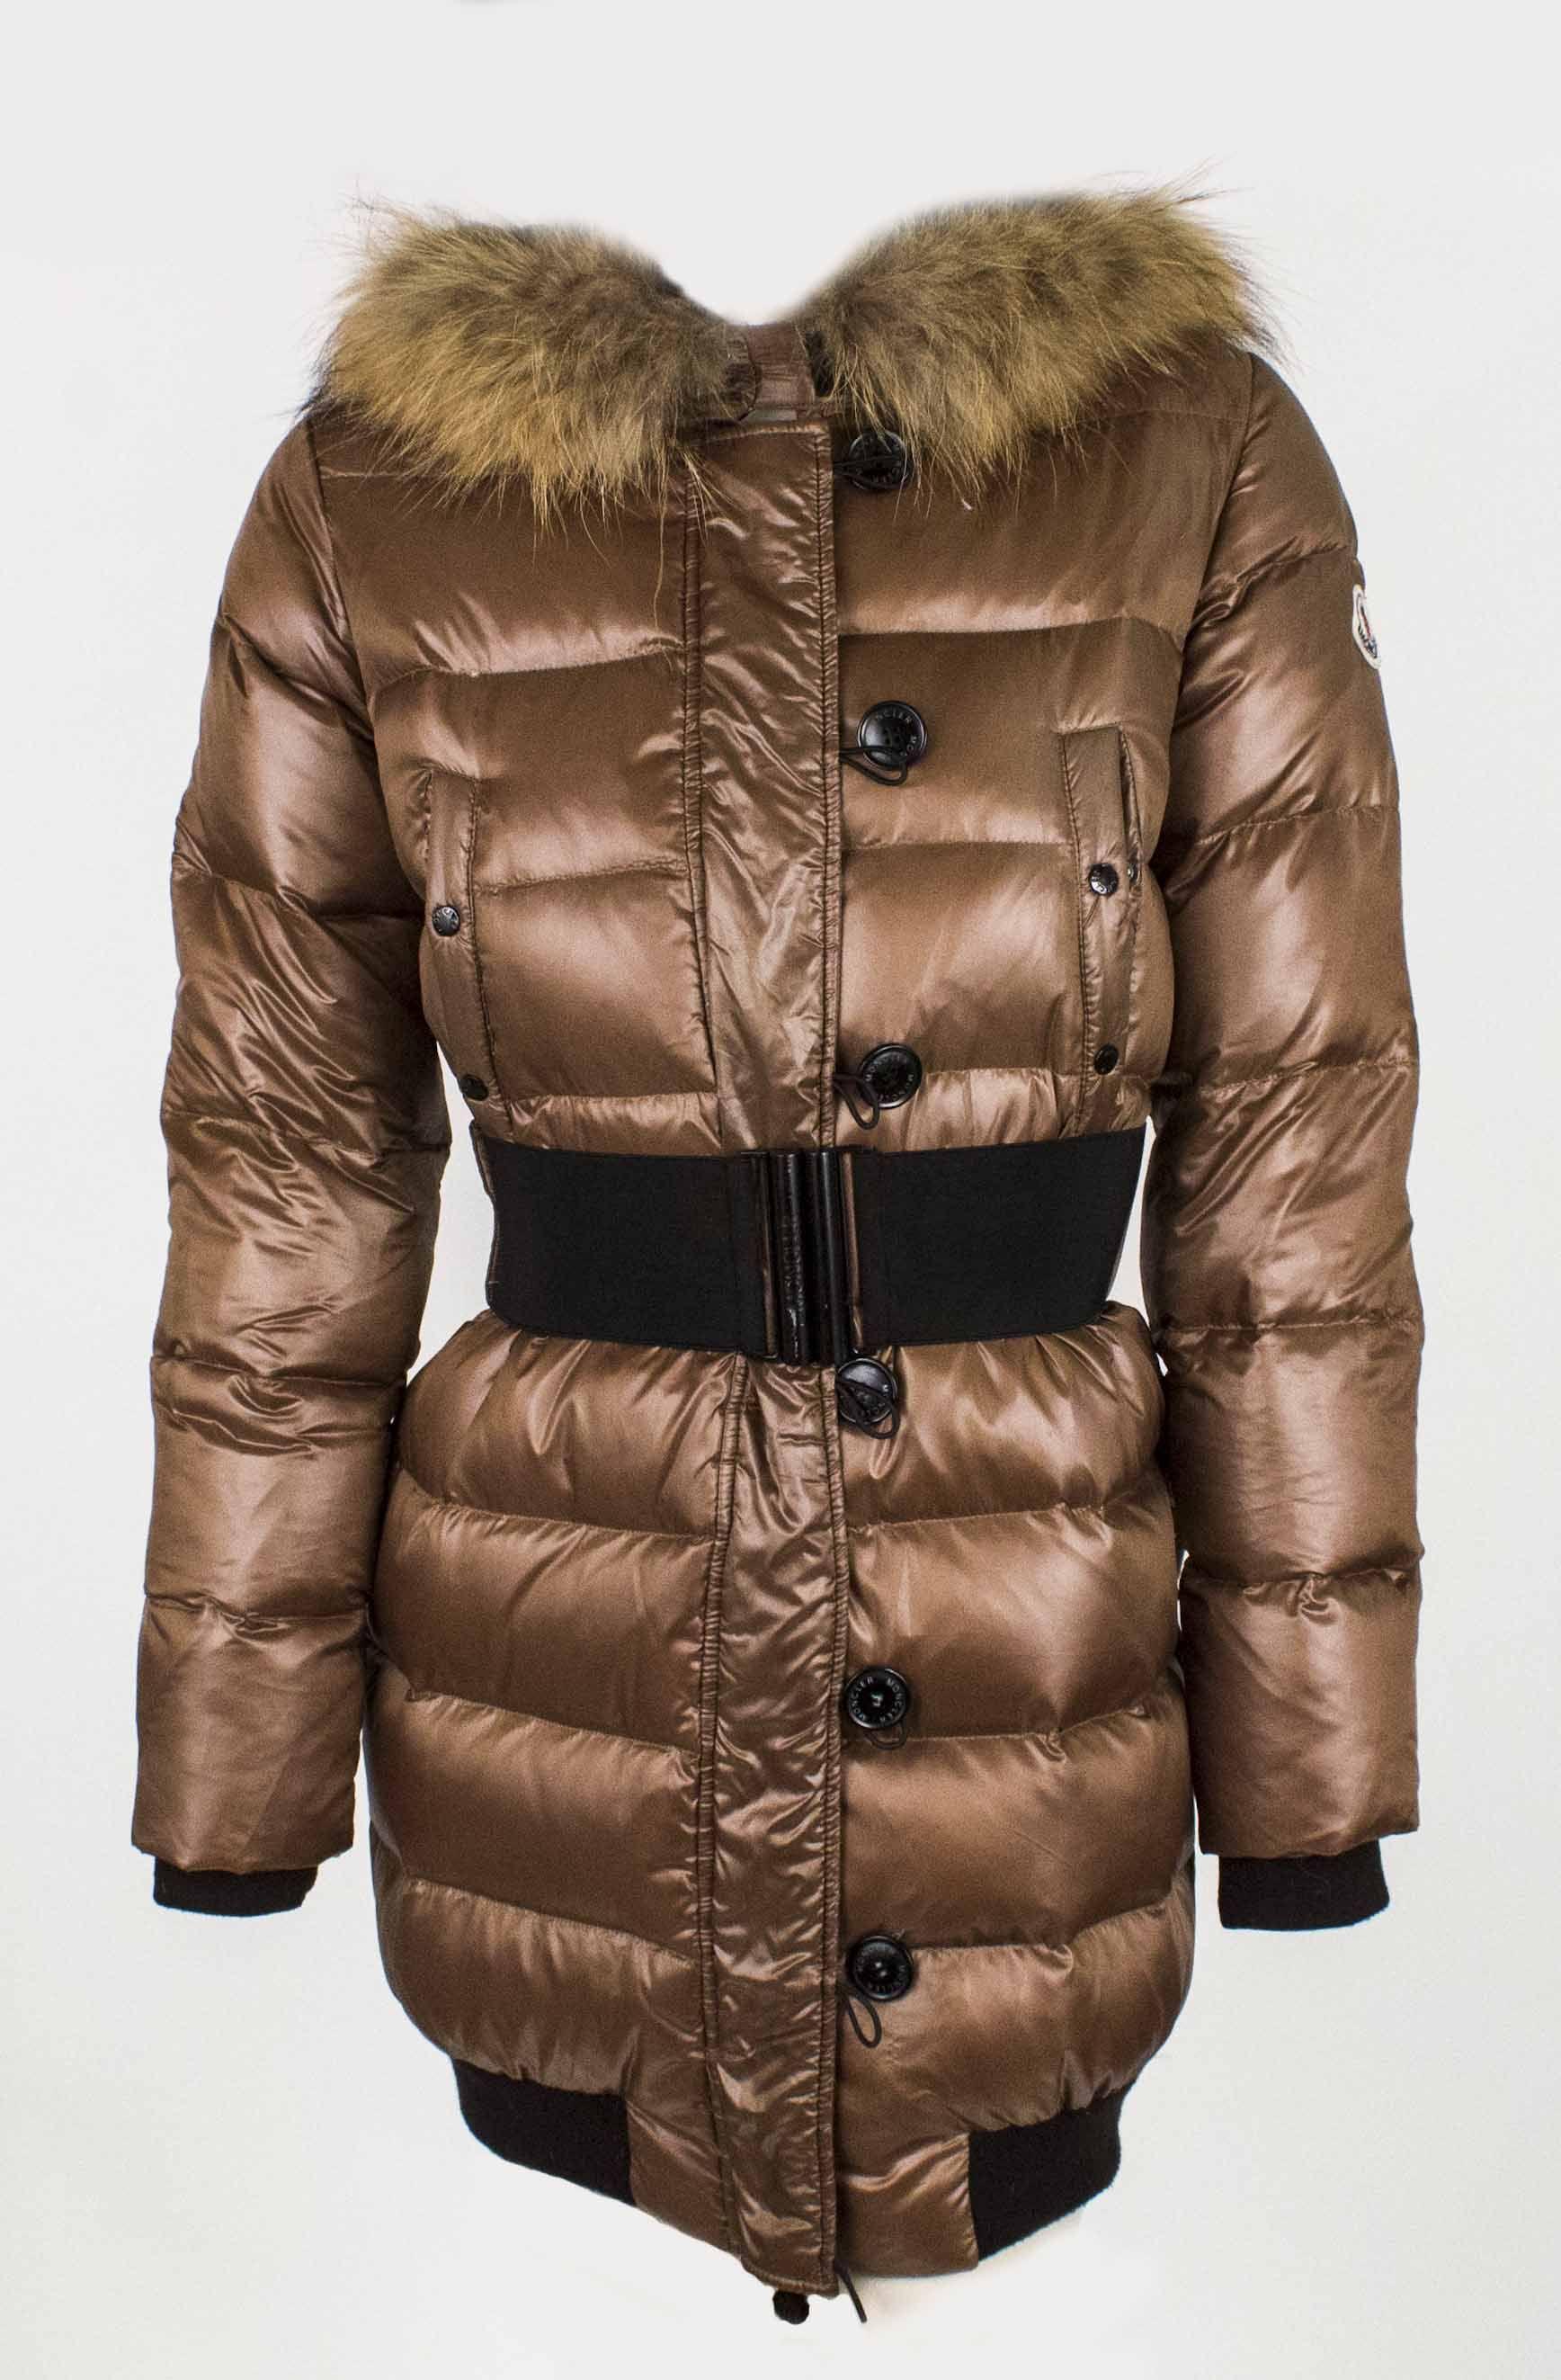 Moncler  Puffa Coat. - http://www.pandoradressagency.com/latest-arrivals/product/moncler-5/